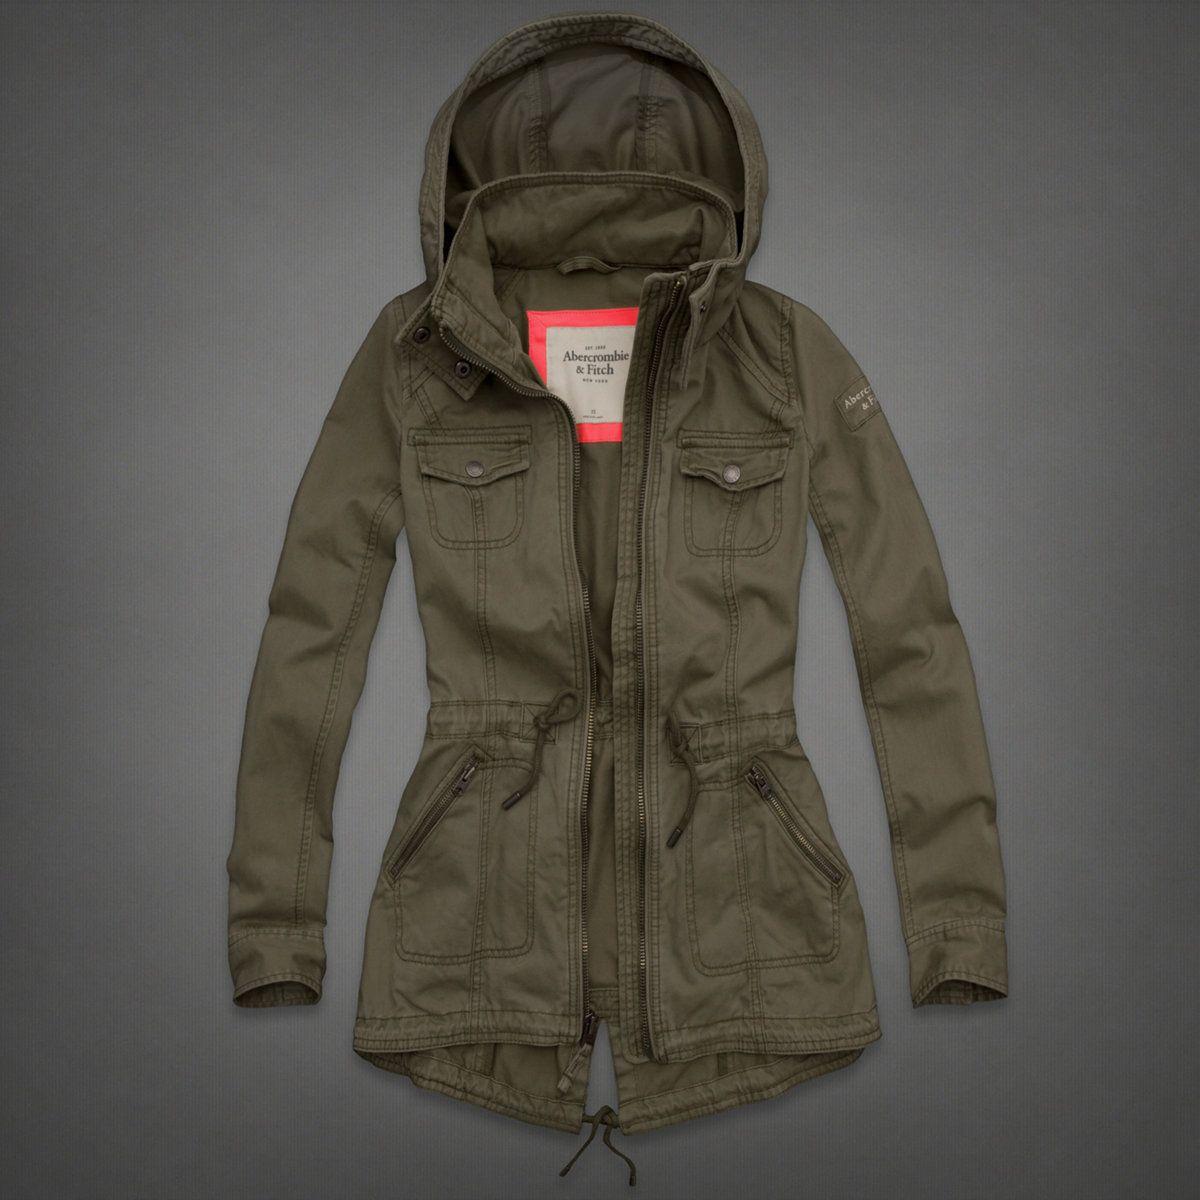 Womens Renee Parka Womens New Arrivals Abercrombie Ca Outerwear Women Jackets Women S Coats Jackets [ 1200 x 1200 Pixel ]